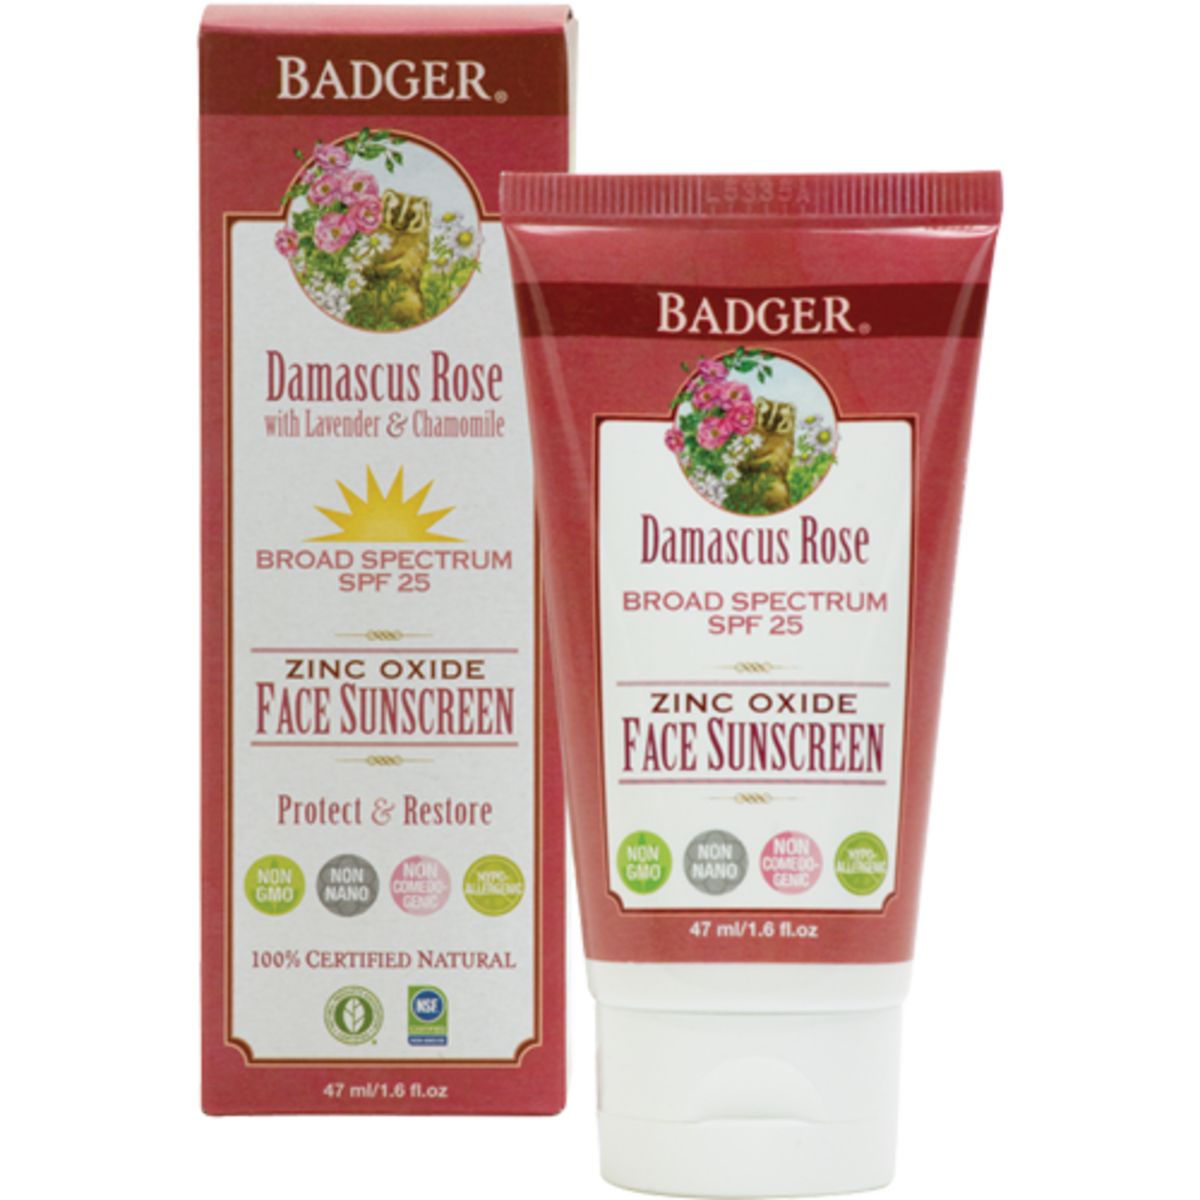 Badger Damascus Rose SPF 25 Face Sunscreen Lotion